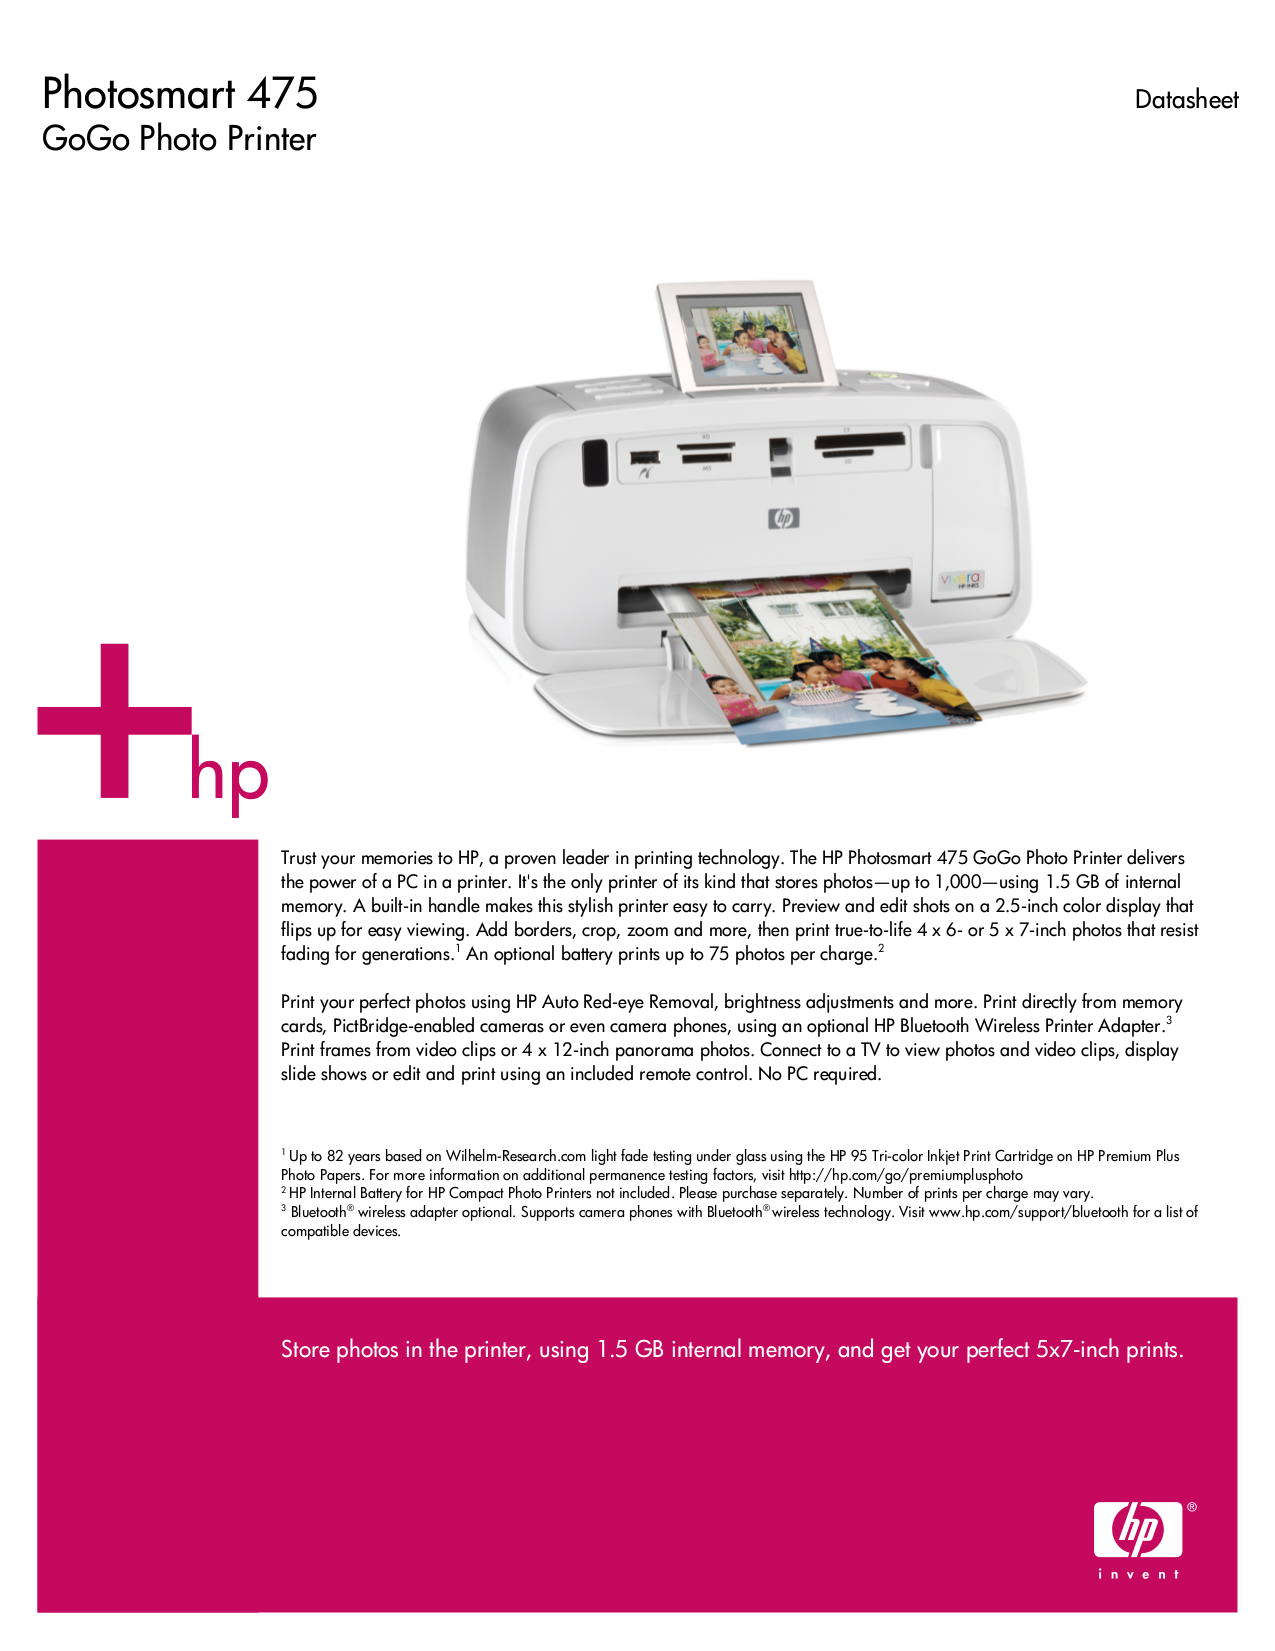 download free pdf for hp photosmart 475 printer manual rh umlib com hp photosmart 8150 manual hp photosmart 8250 manual